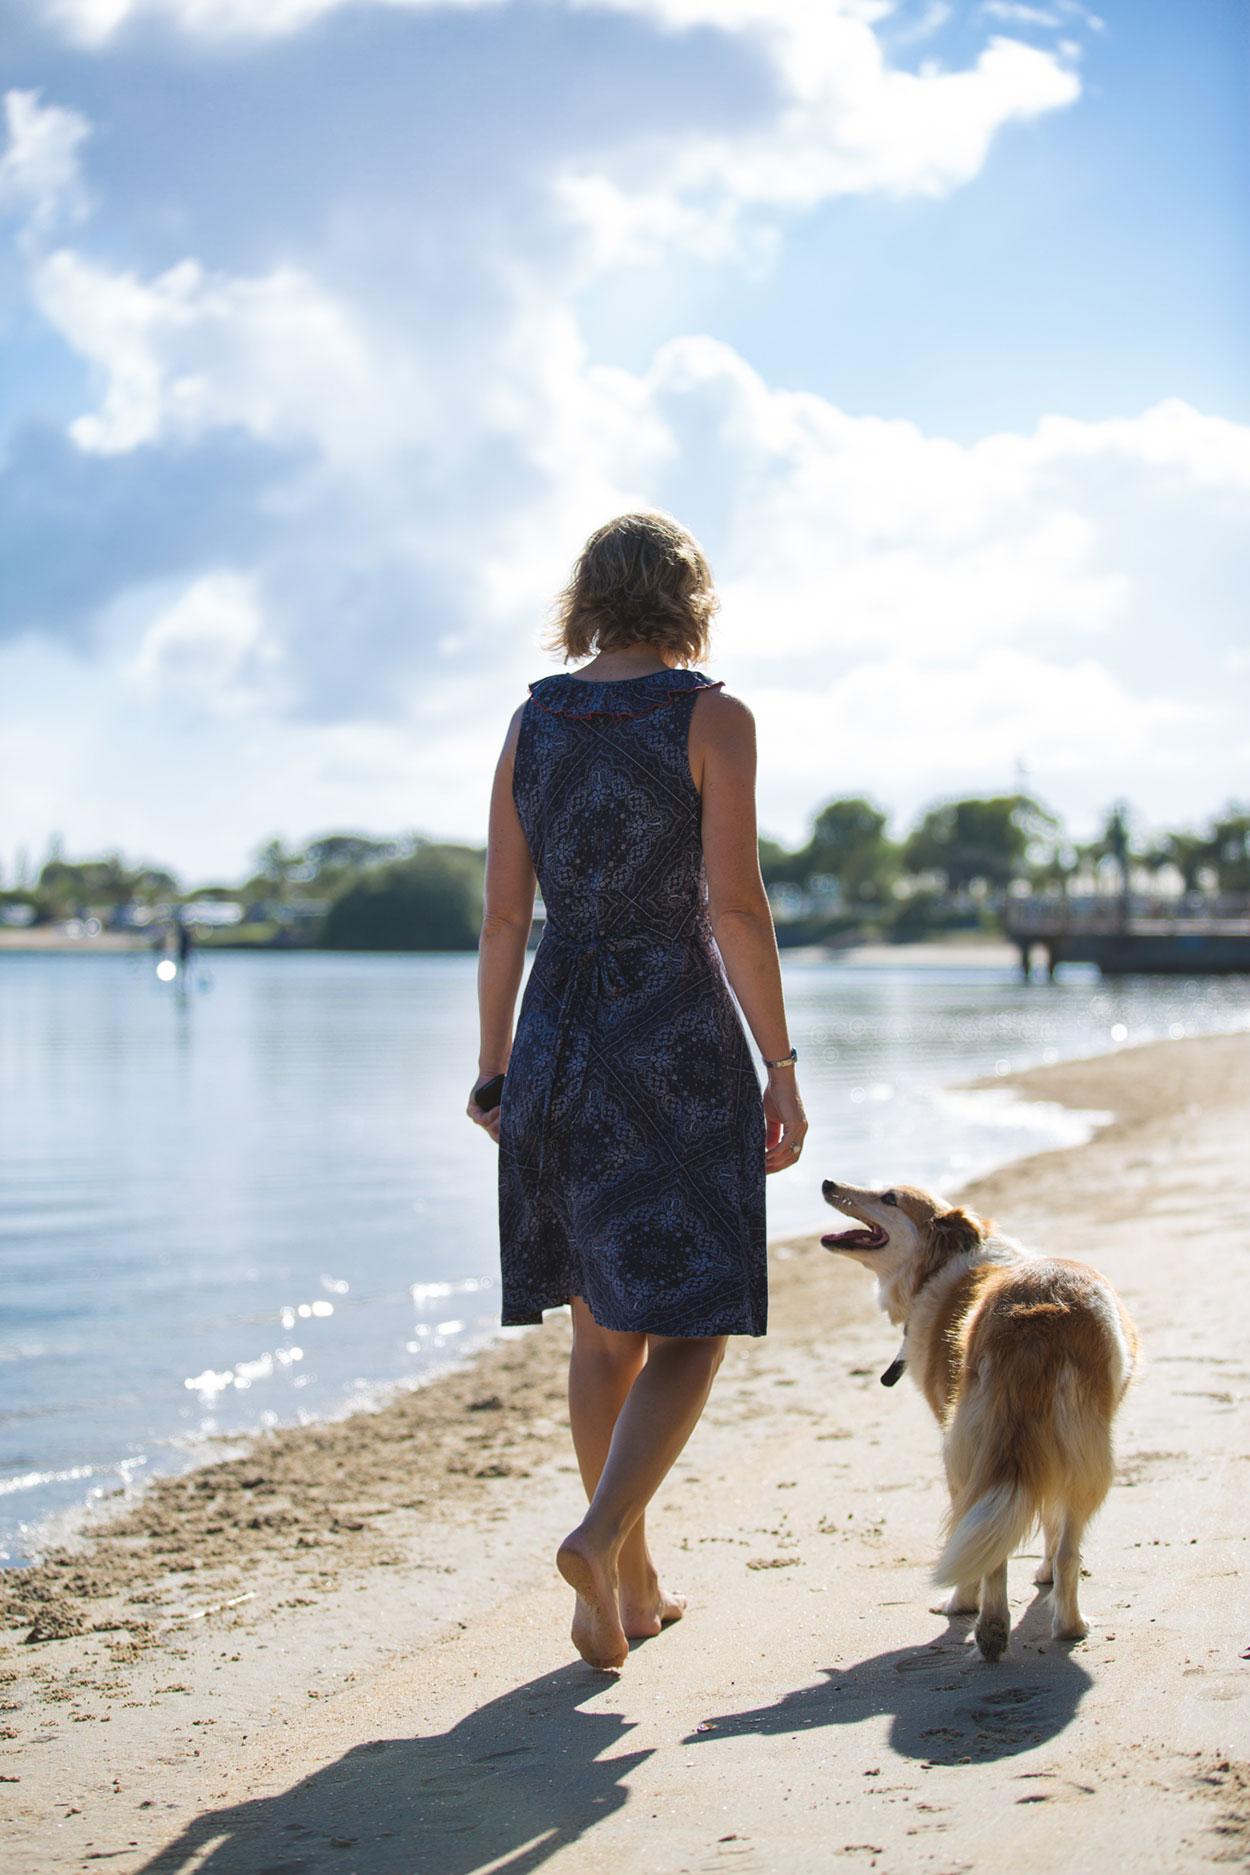 sunshine-coast-pet-photographer-animal-mooloolaba-maroochydore-buderim-mudjimba-marcoola-coolum-beach-sunrise-noosa-australian-maleny-caloundra-dog-all-the-love-in-the-world-photography-08